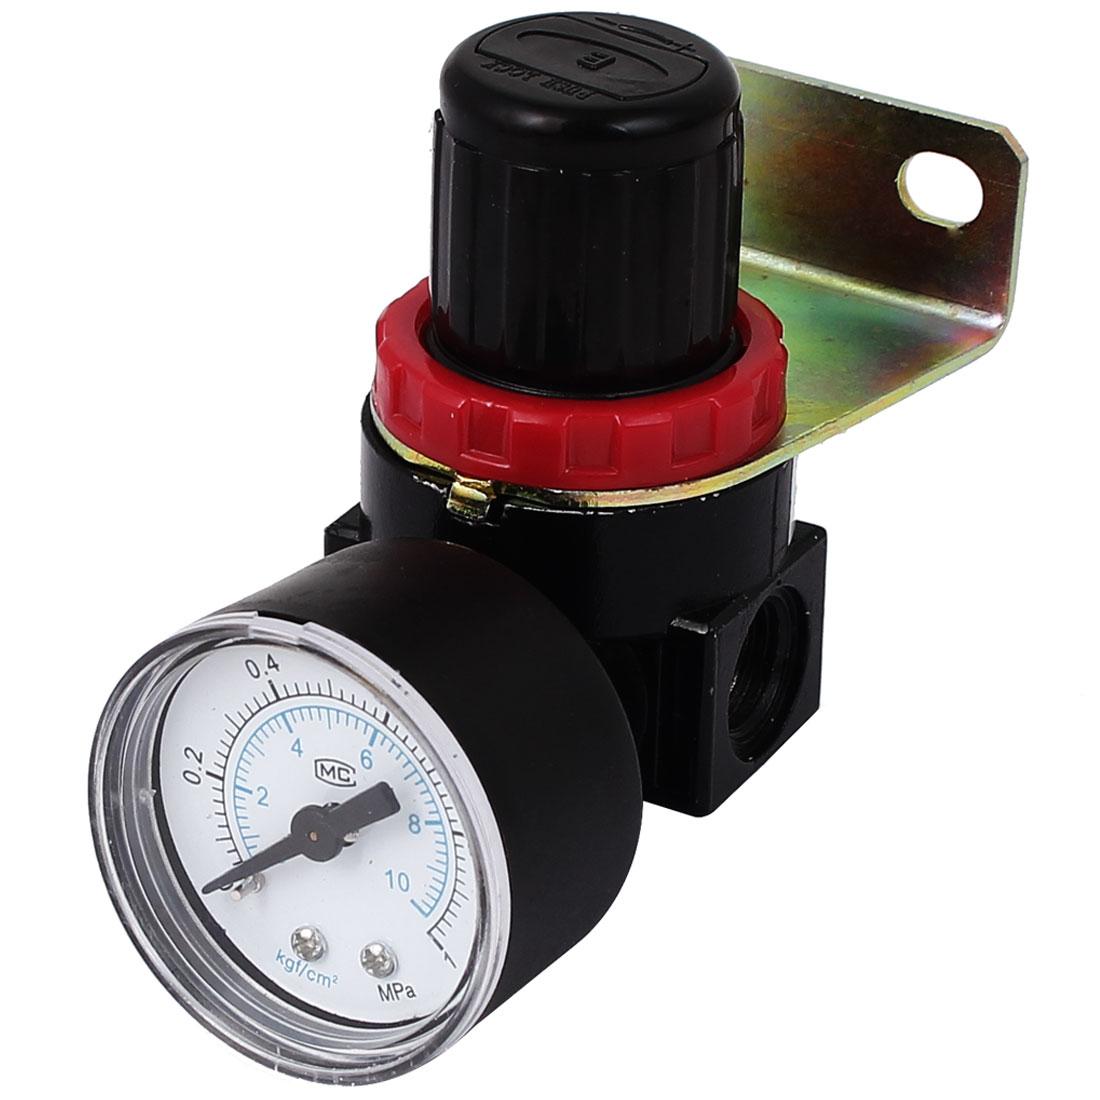 AR2000 Adjustable Pressure Gauge Air Source Filter Pneumatic Regulator Valve